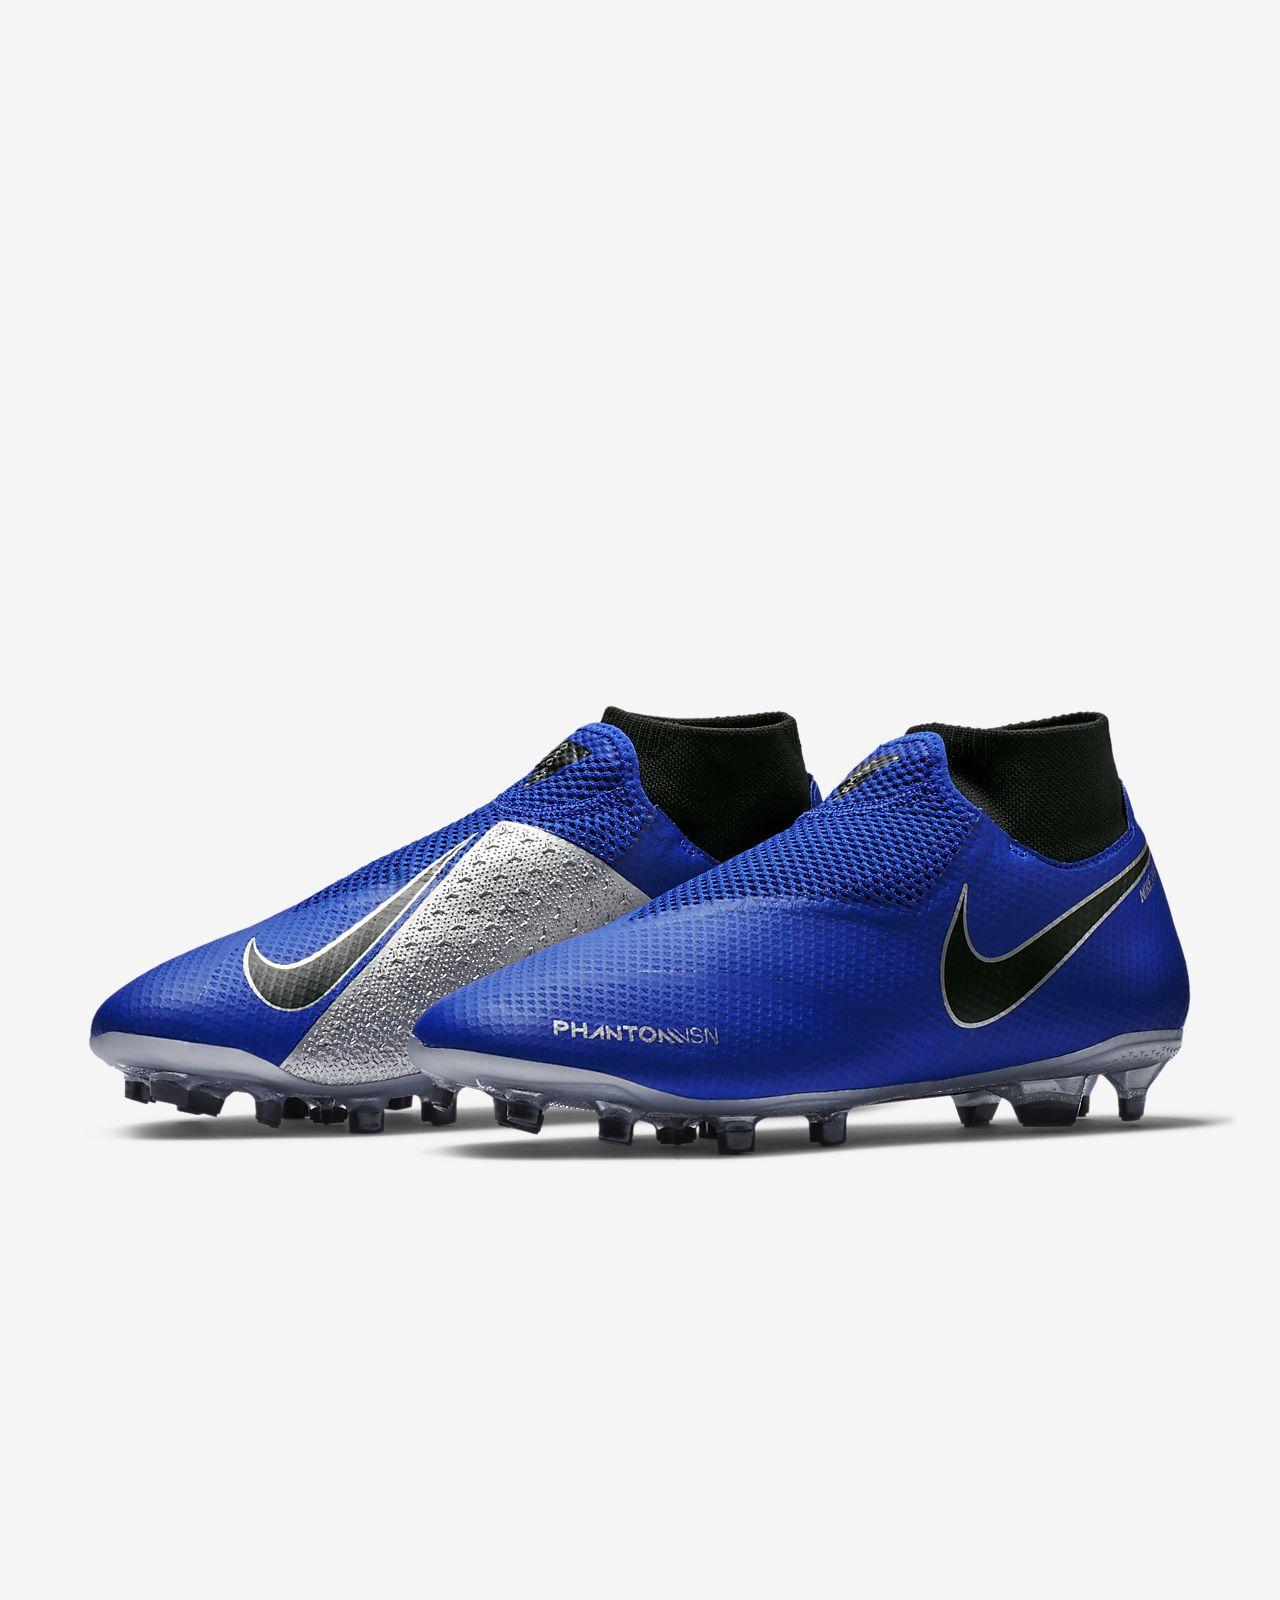 ... Calzado de fútbol para terreno firme Nike PhantomVSN Pro Dynamic Fit FG 026ca50c869